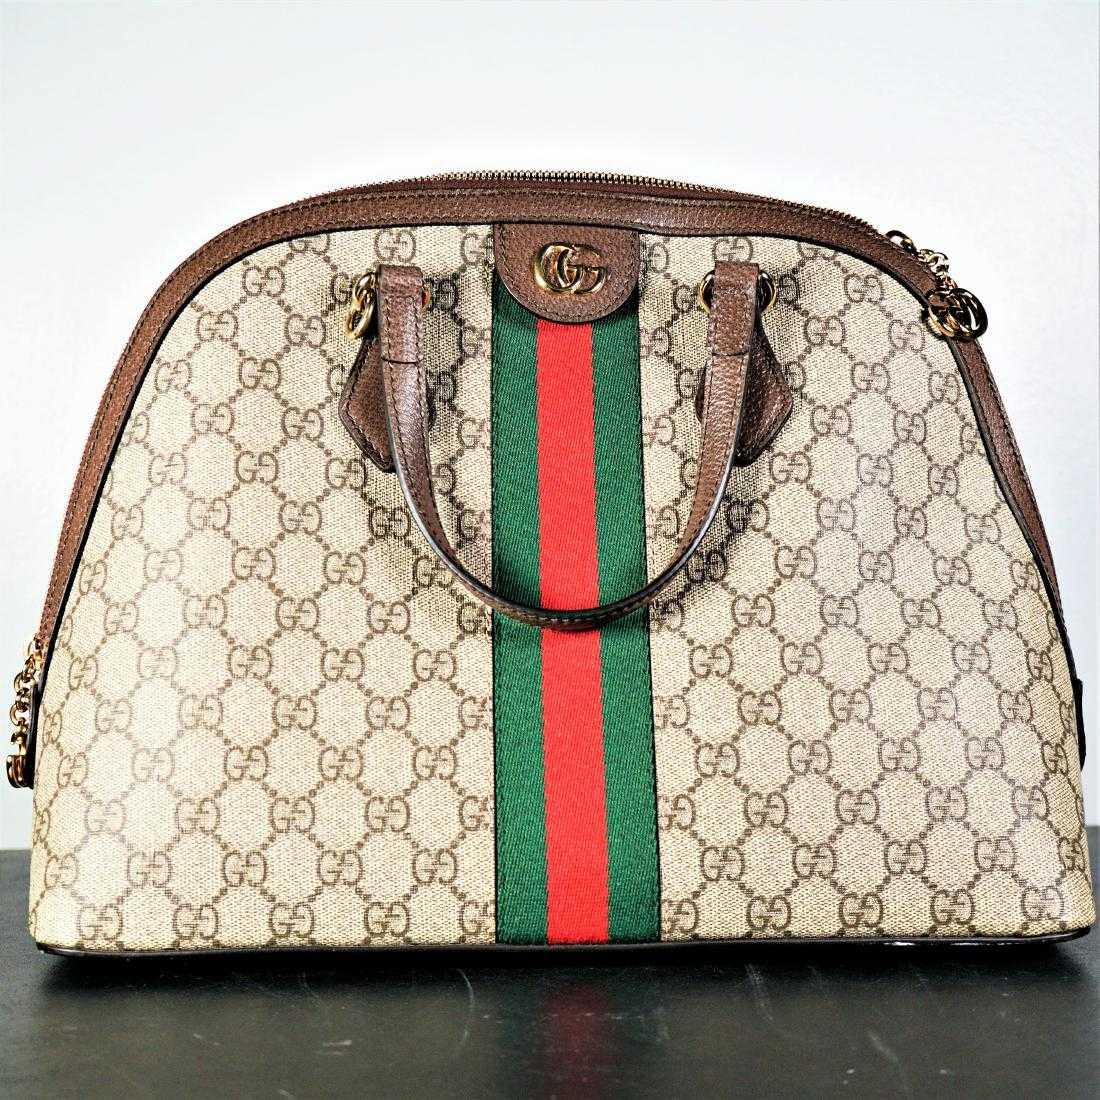 00b658ec8bf Ophidia Medium Web GG Supreme Top-Handle Bag